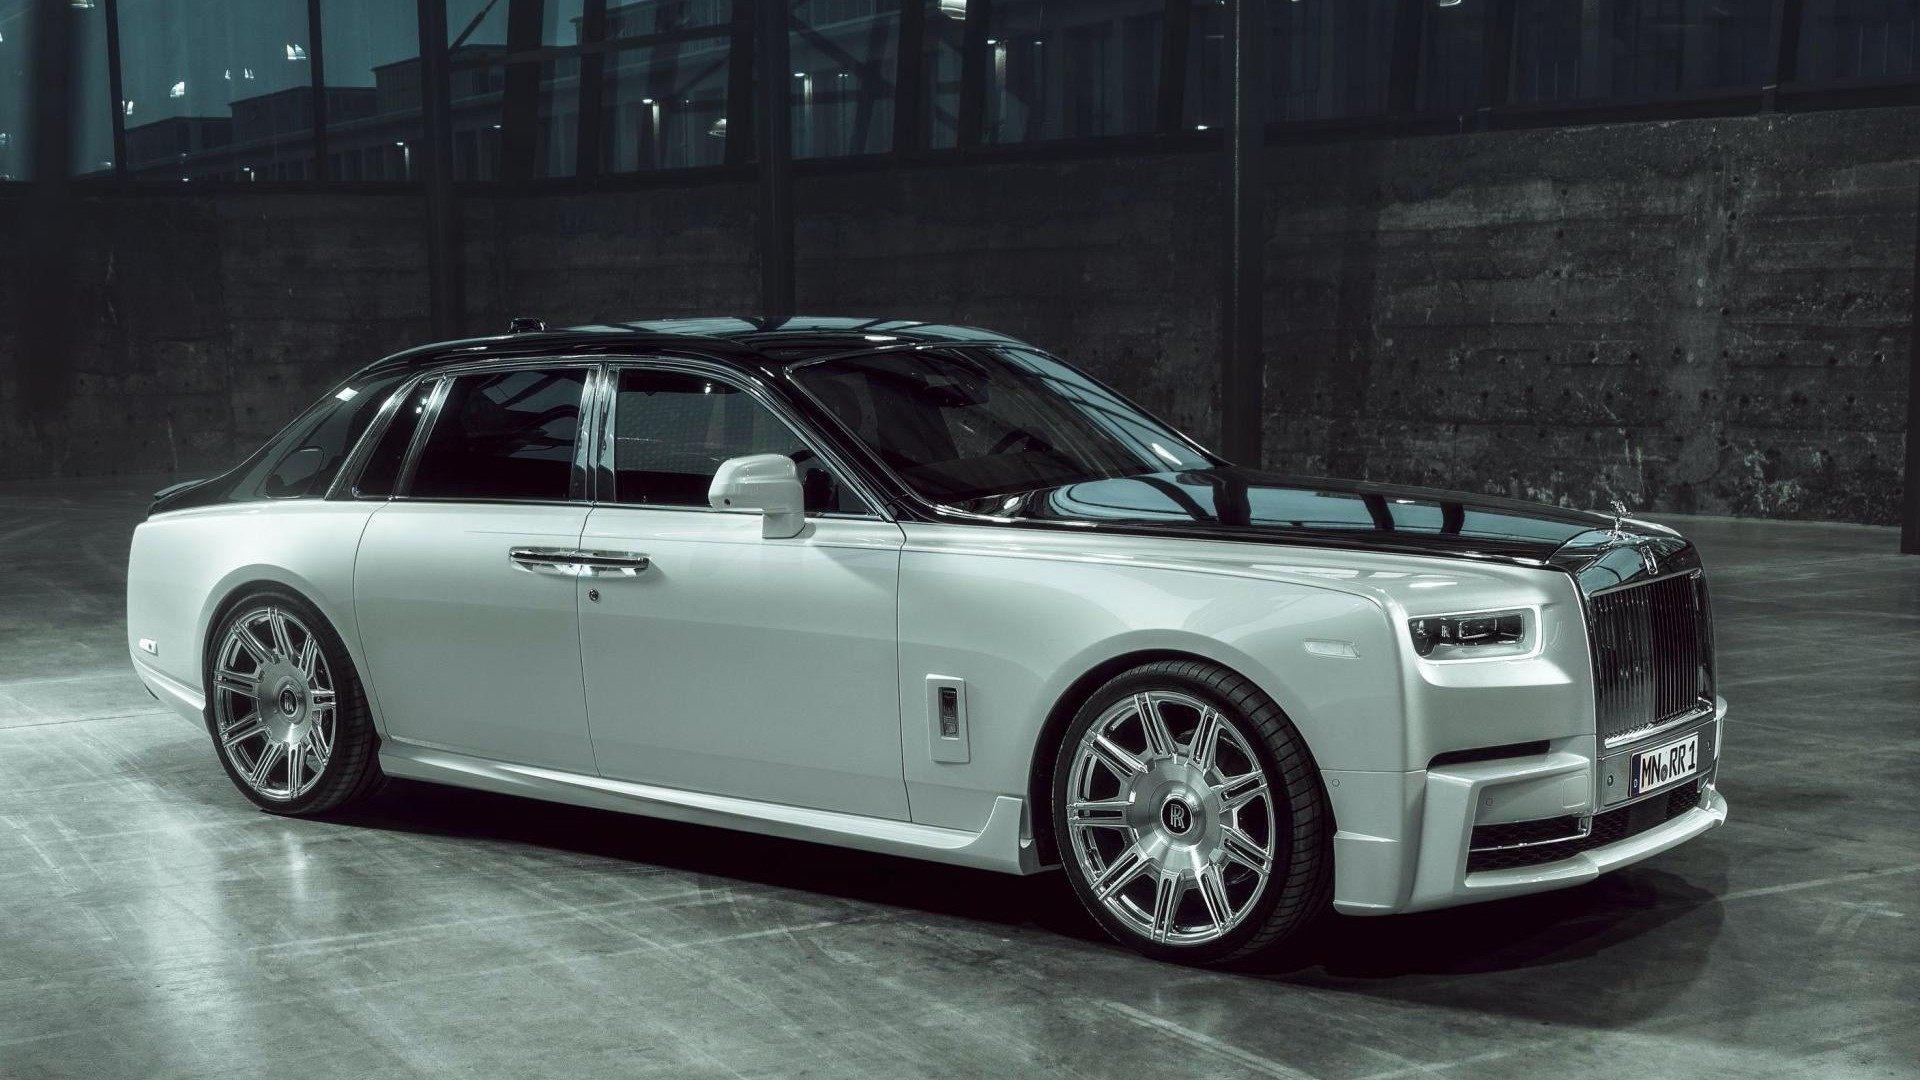 Rolls Royce Phantom Novitec Spofec (13)